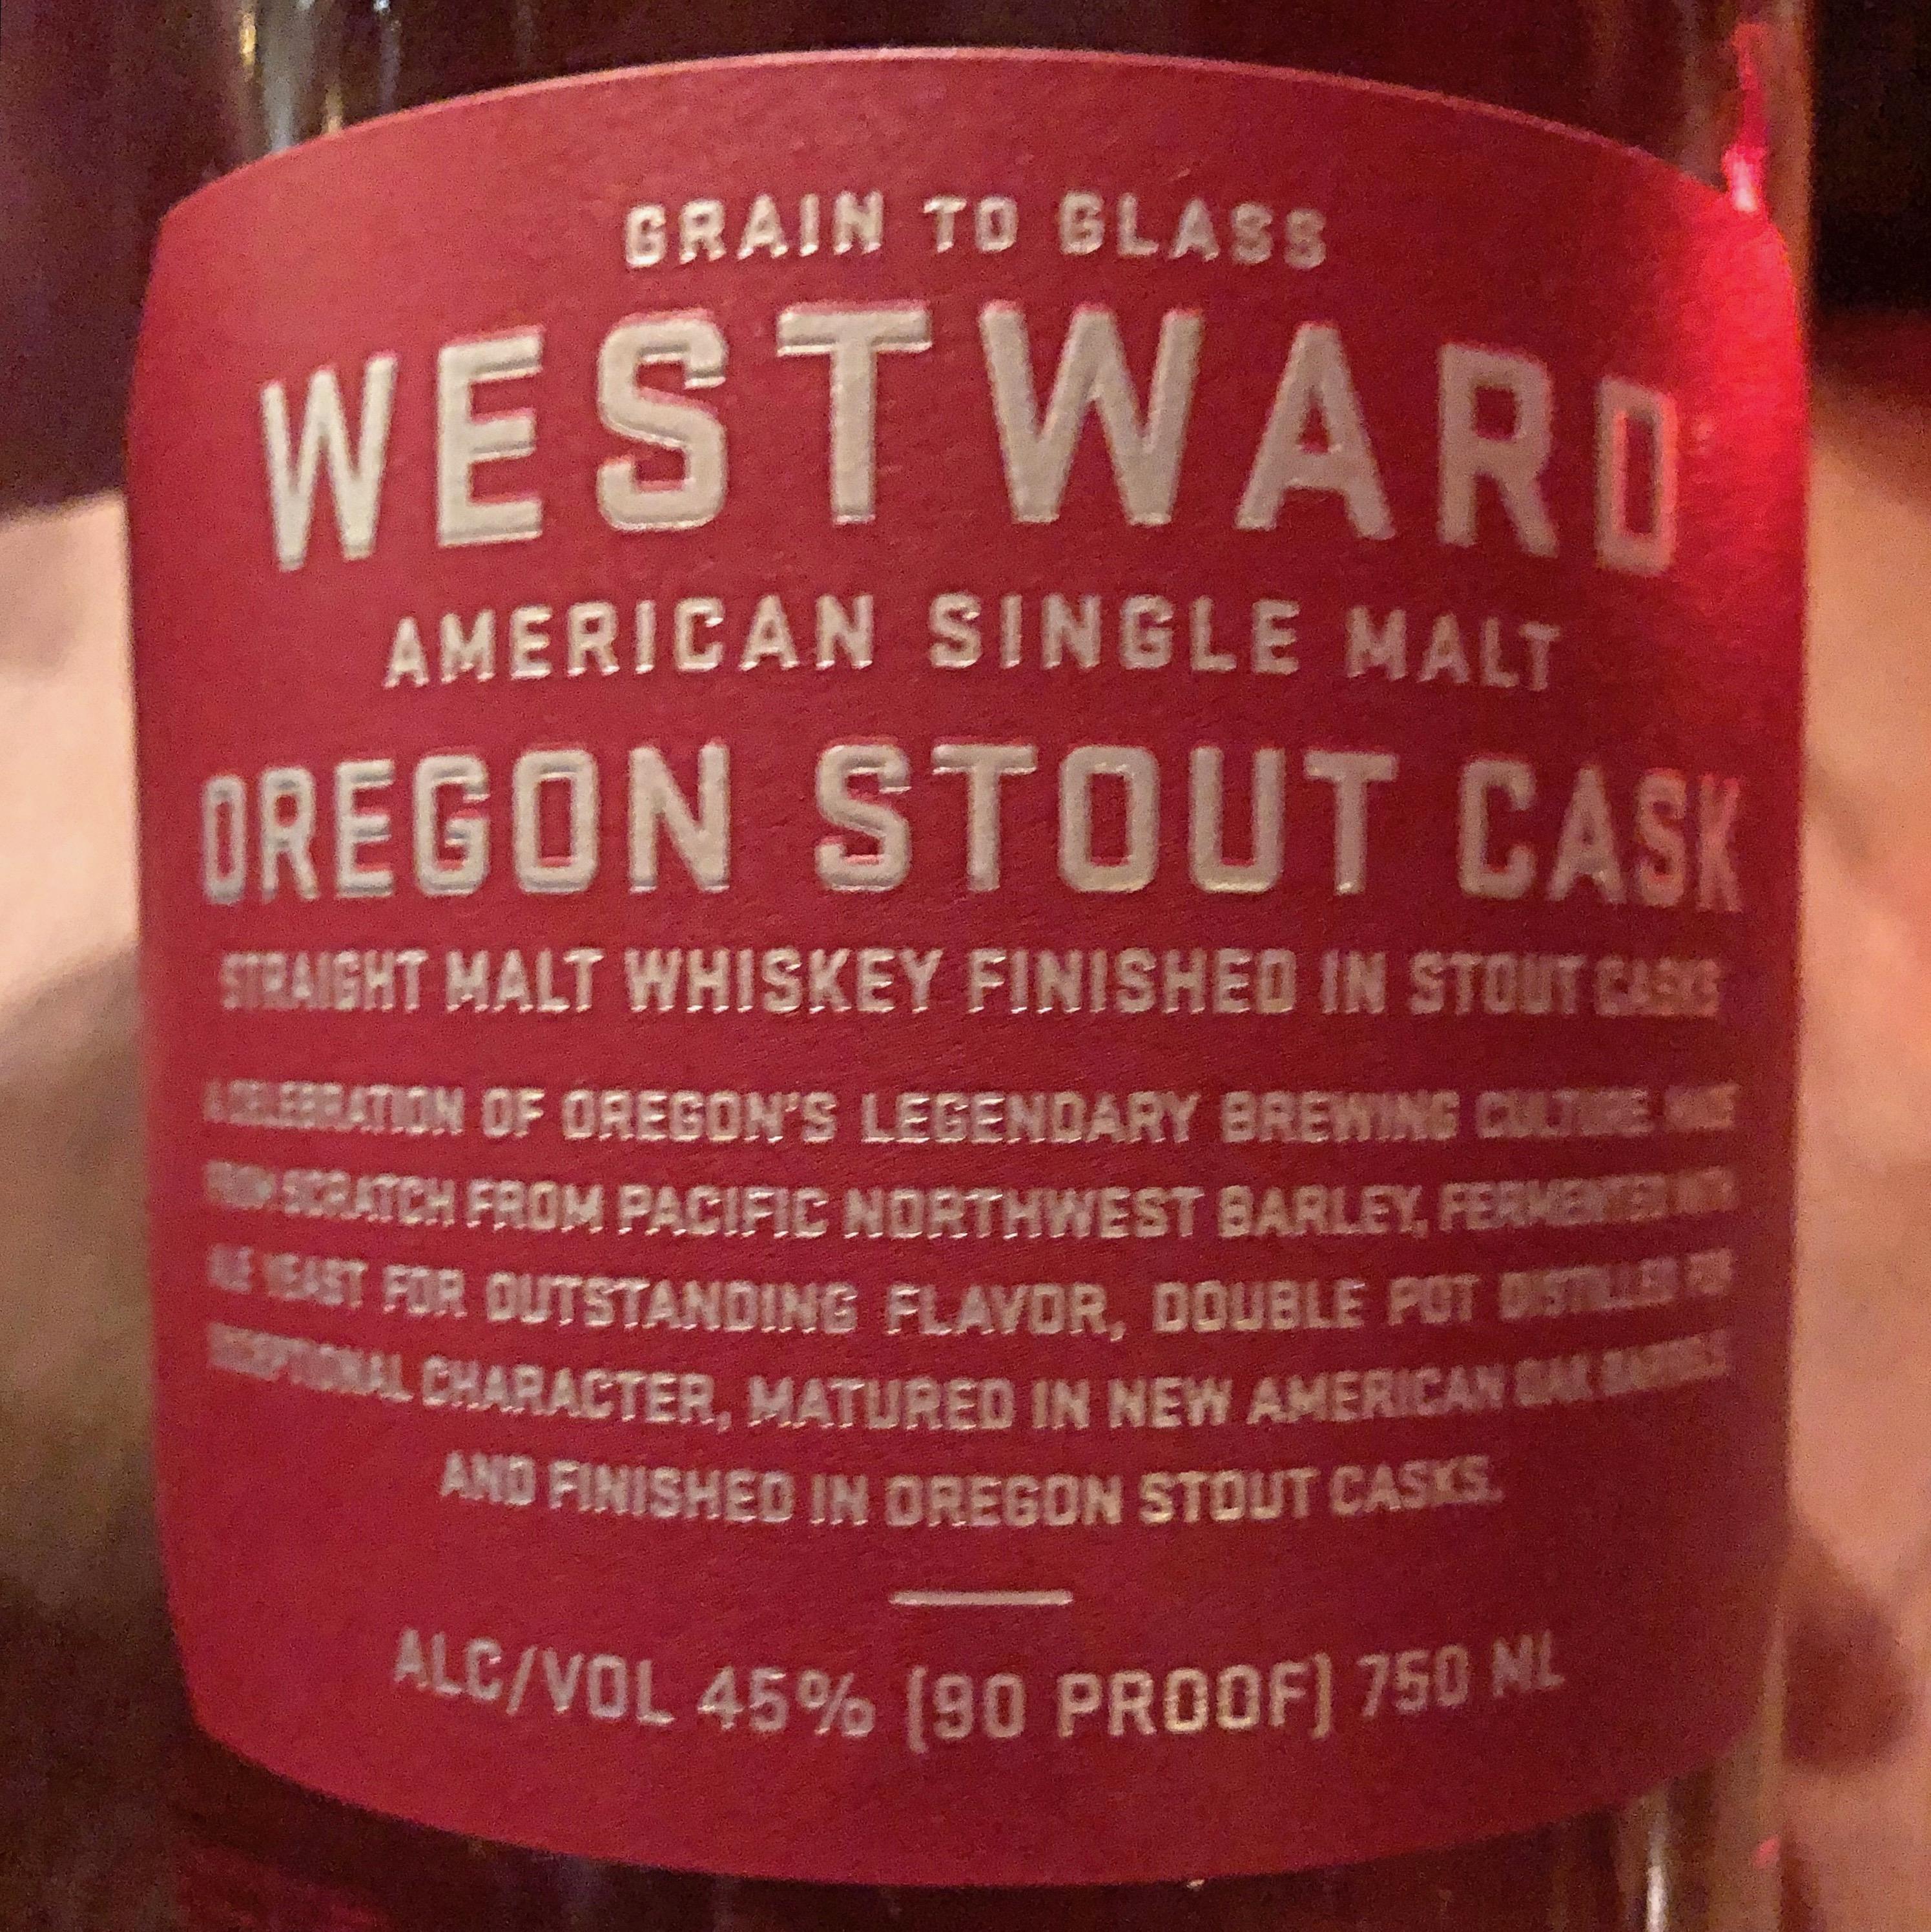 The label of the new Westward American Single Malt Oregon Stout Cask.